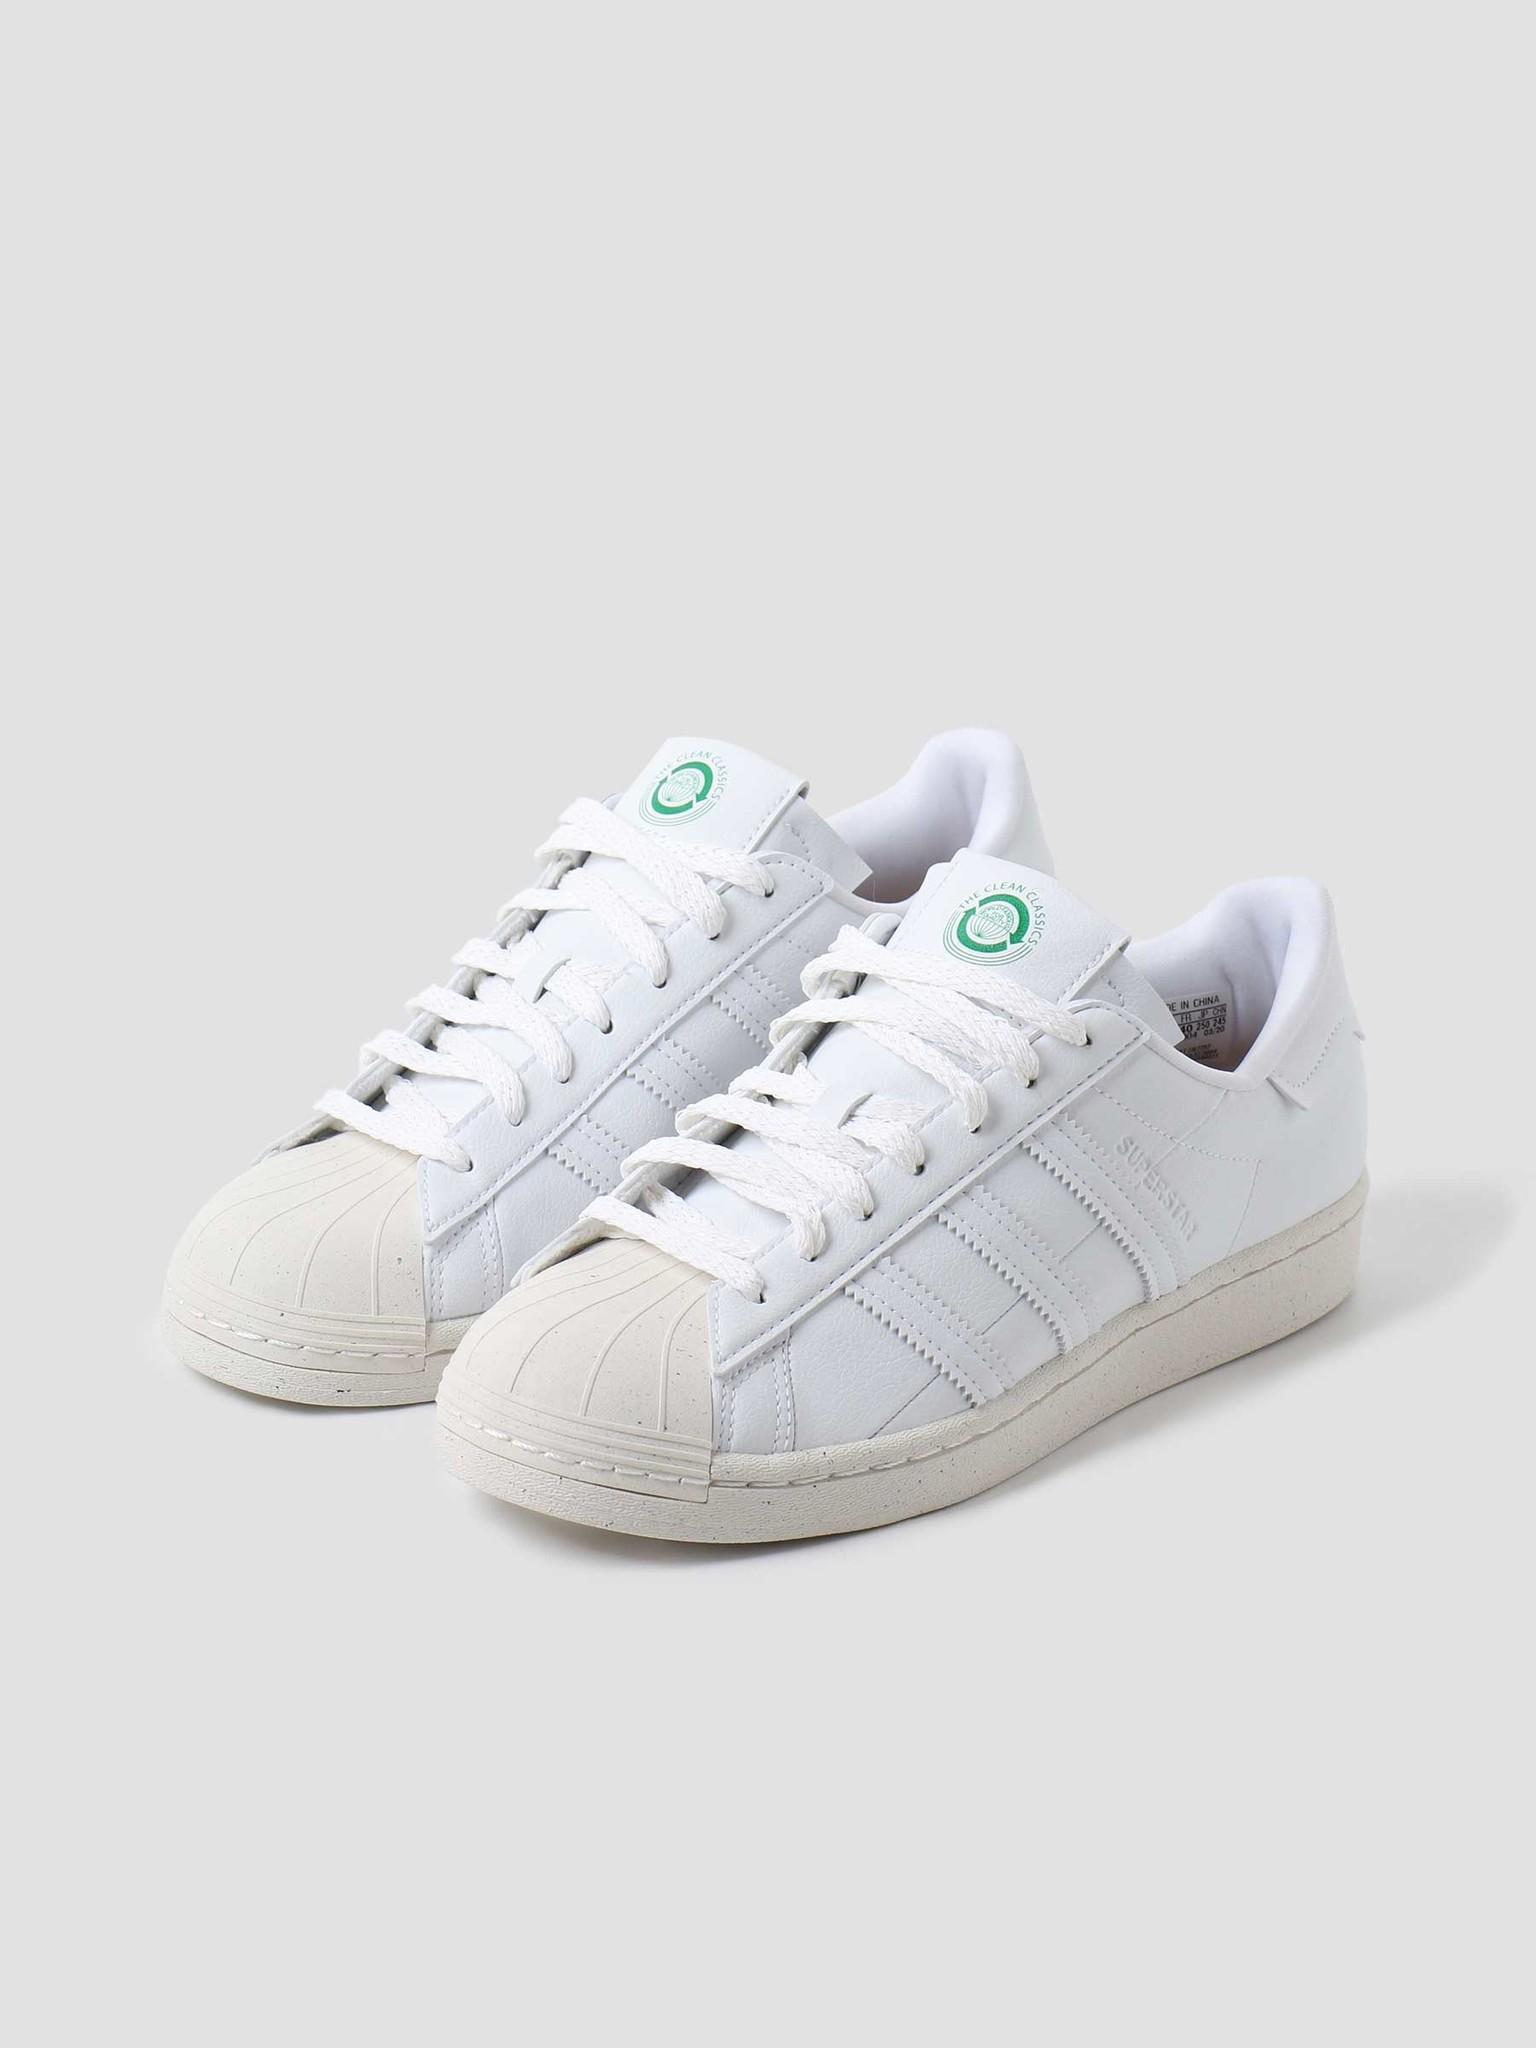 adidas adidas U Superstar Footwear White Off-White Green FW2292